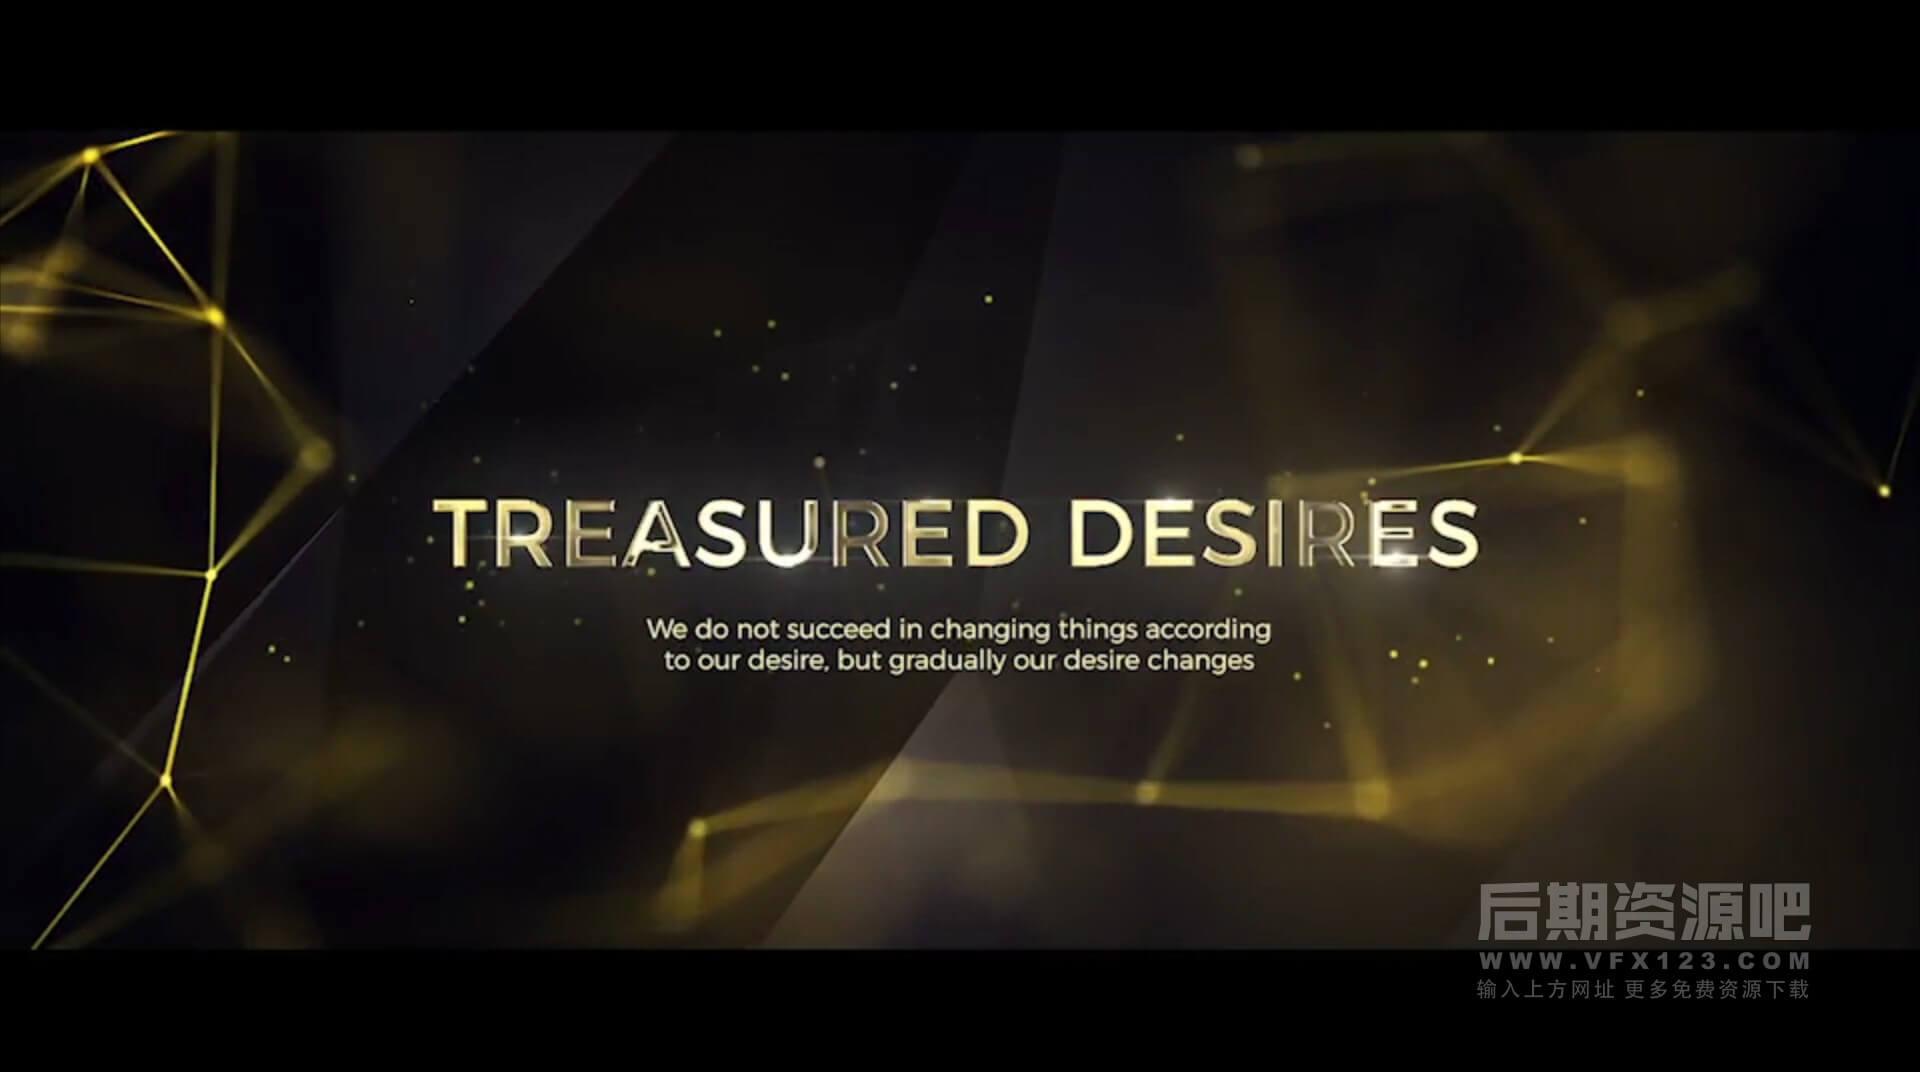 AE模板 大气恢弘点线粒子背景金色文字标题宣传片头 Exquisite Titles